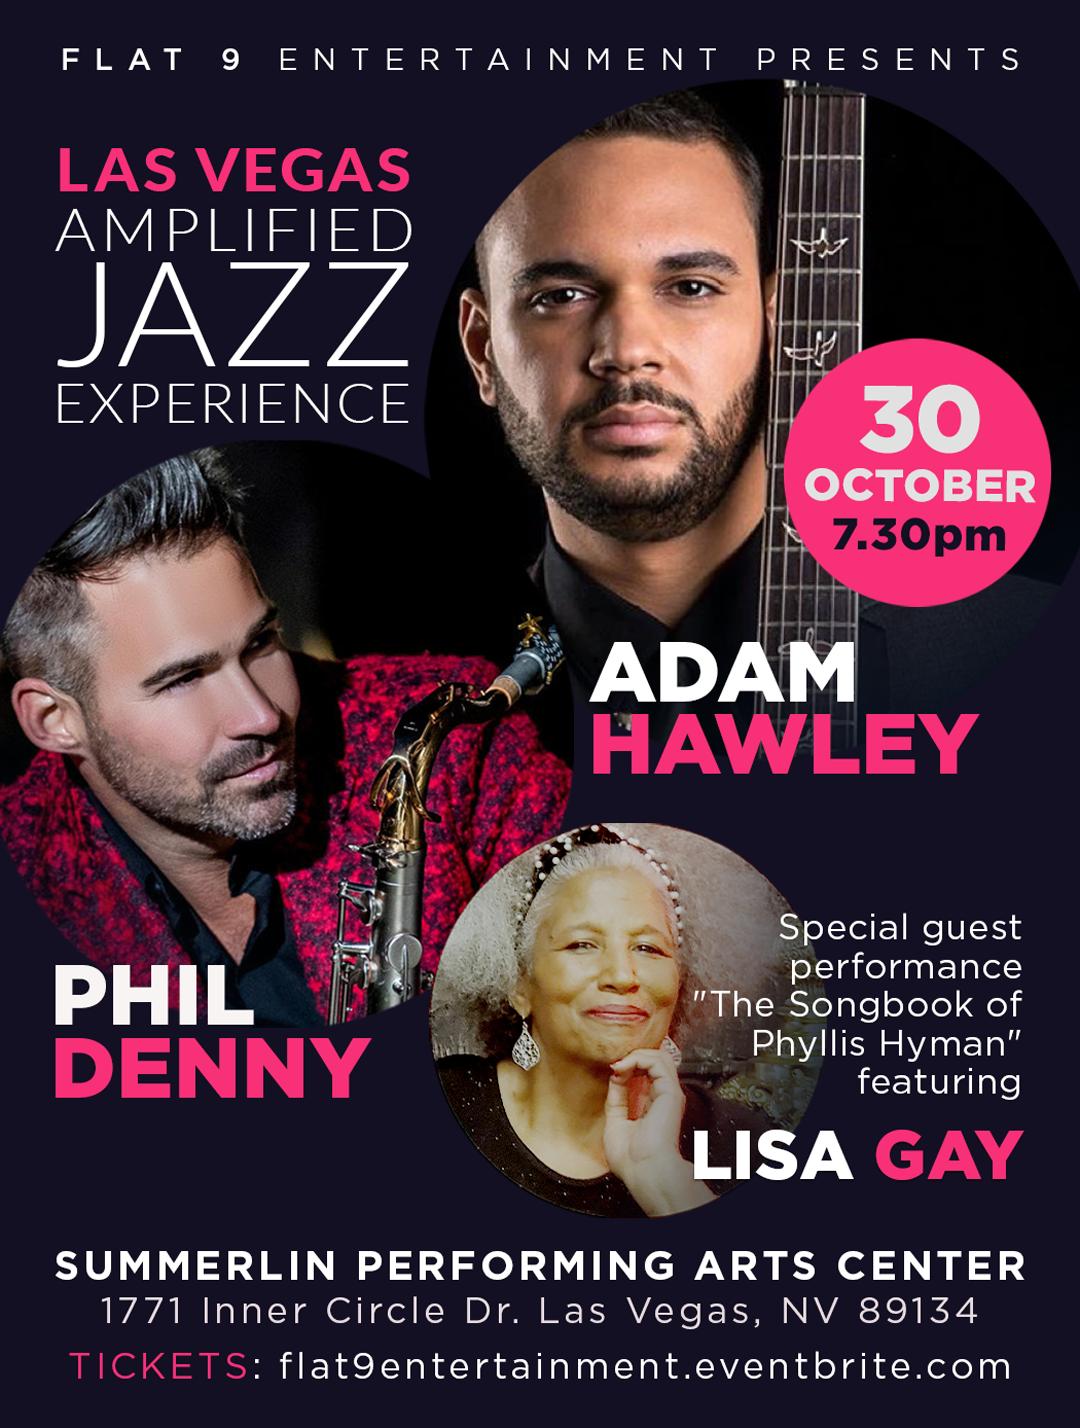 Las Vegas Amplified Jazz Experience - Adam Hawley And Phil Denny